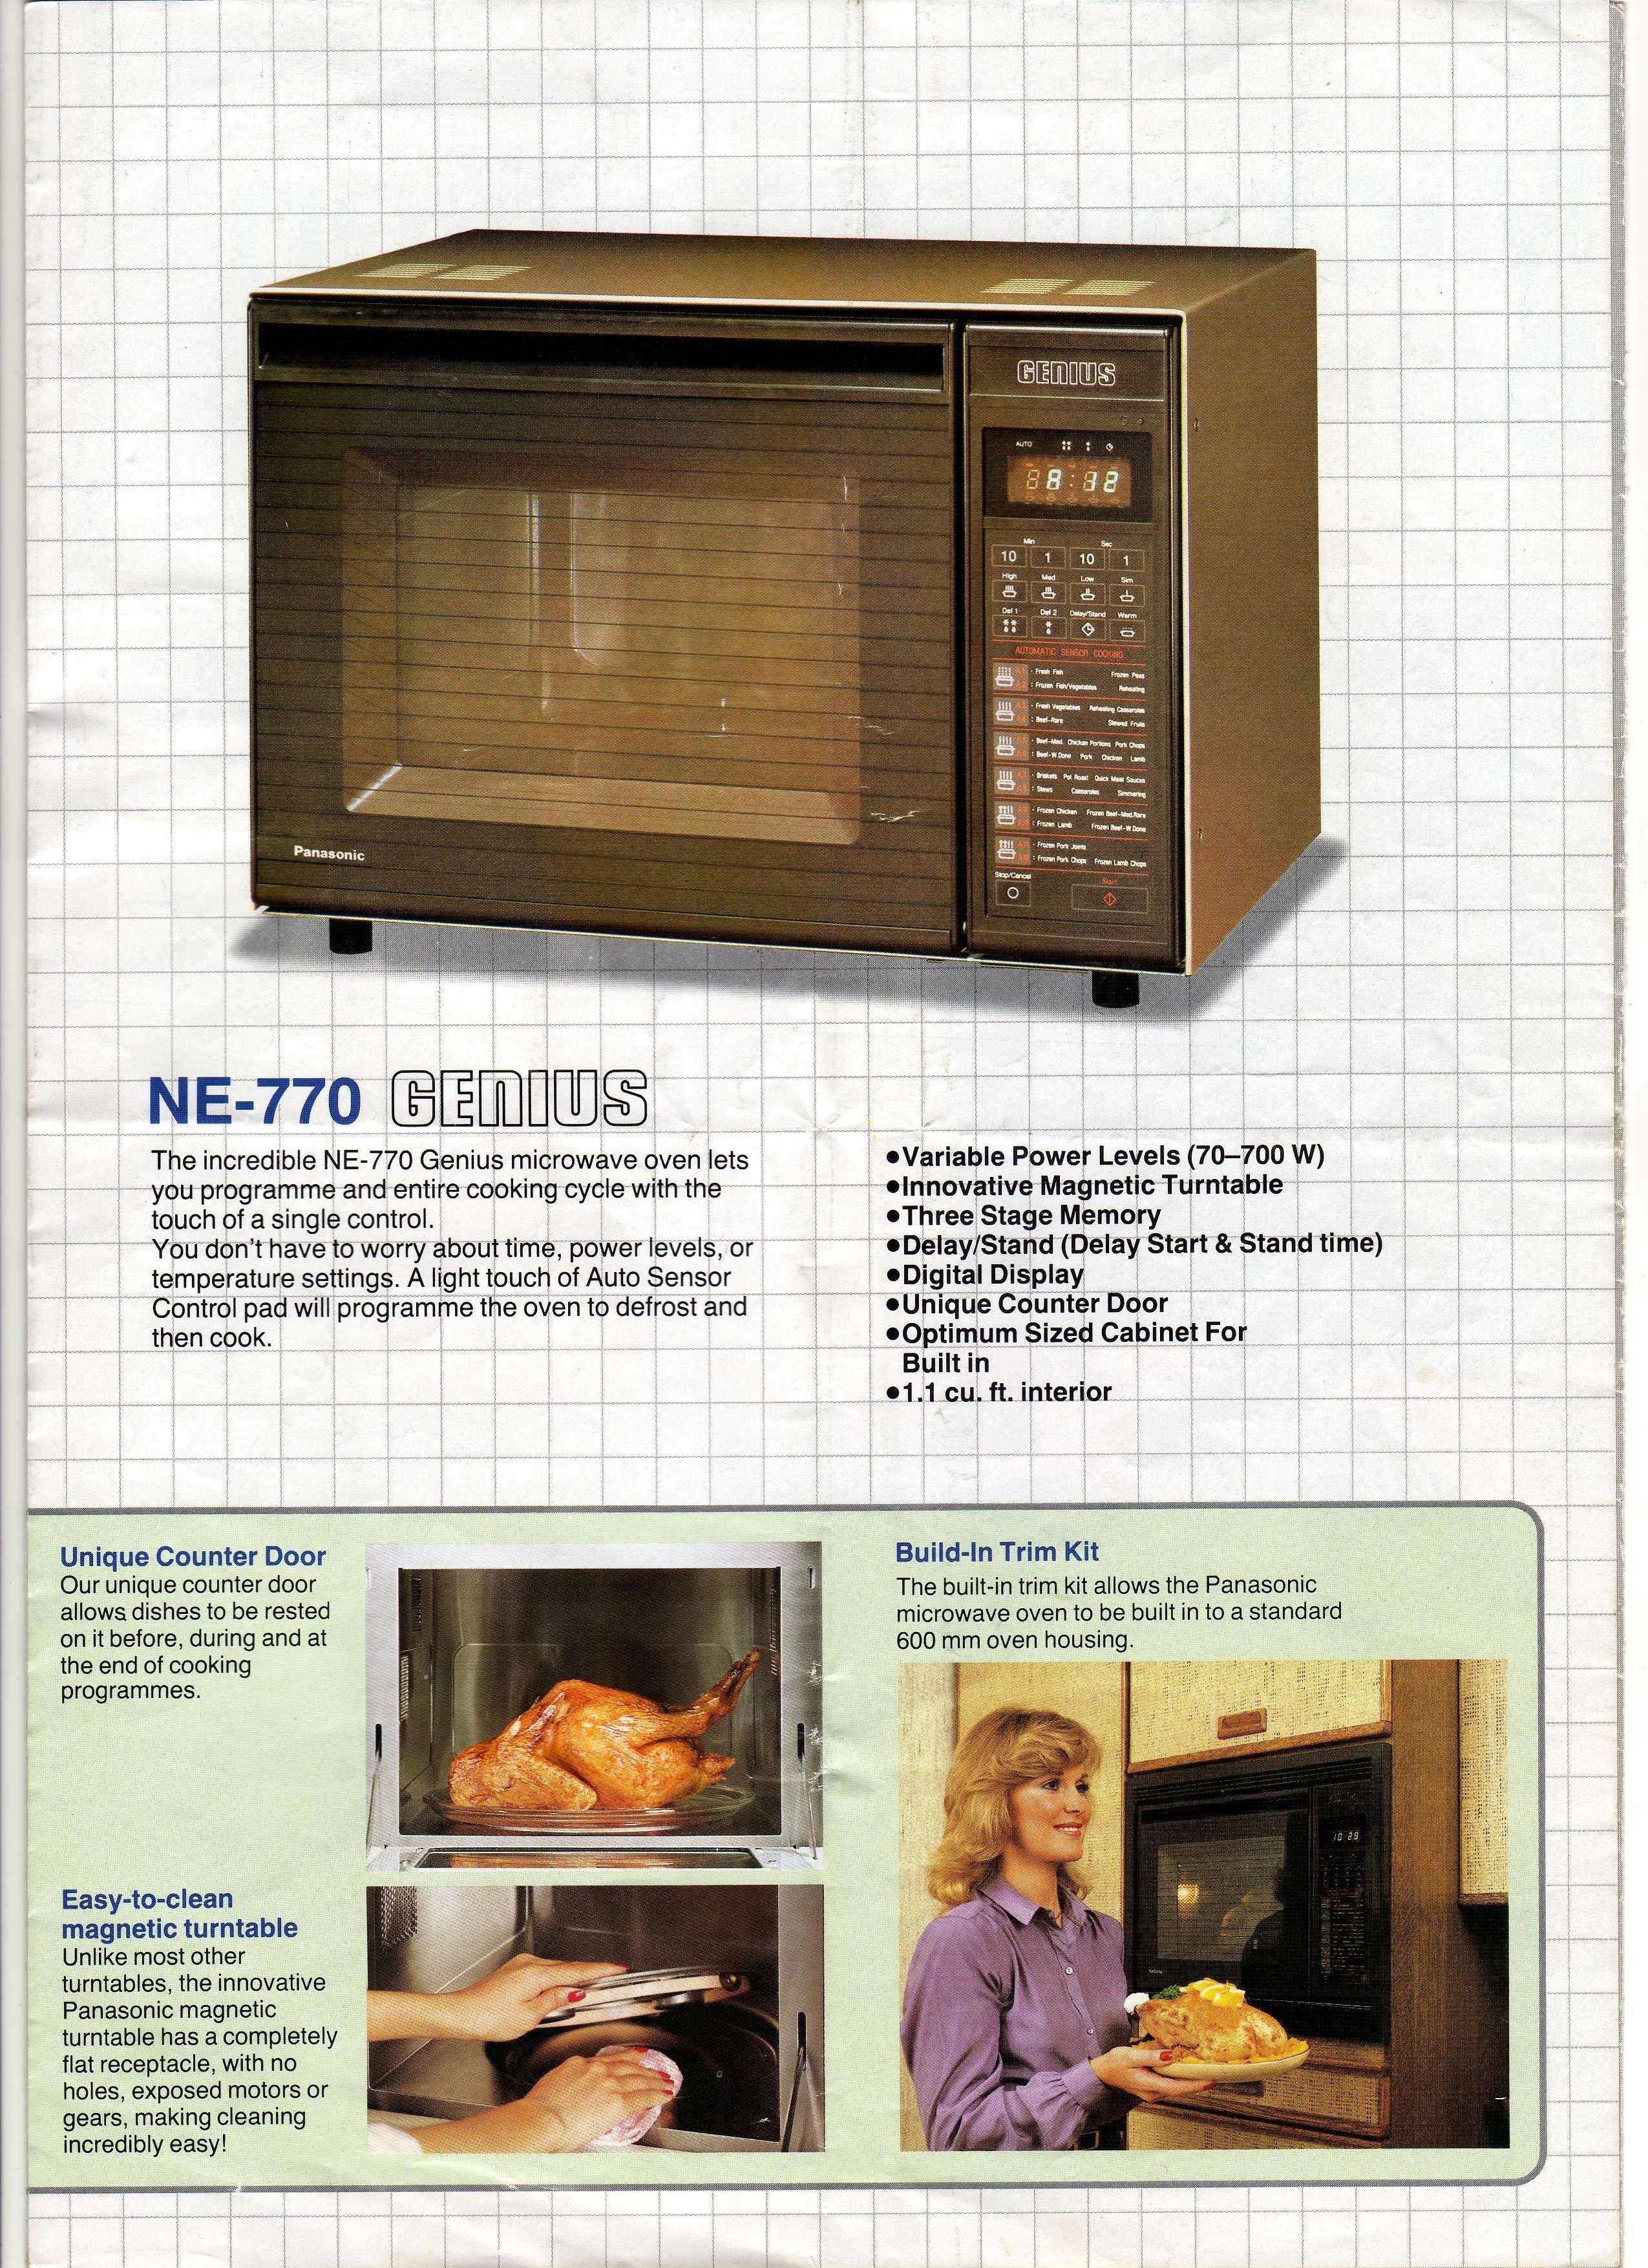 Vintage Panasonic Genius Ne 770 Microwave Oven Ad 1984 We Had One Of